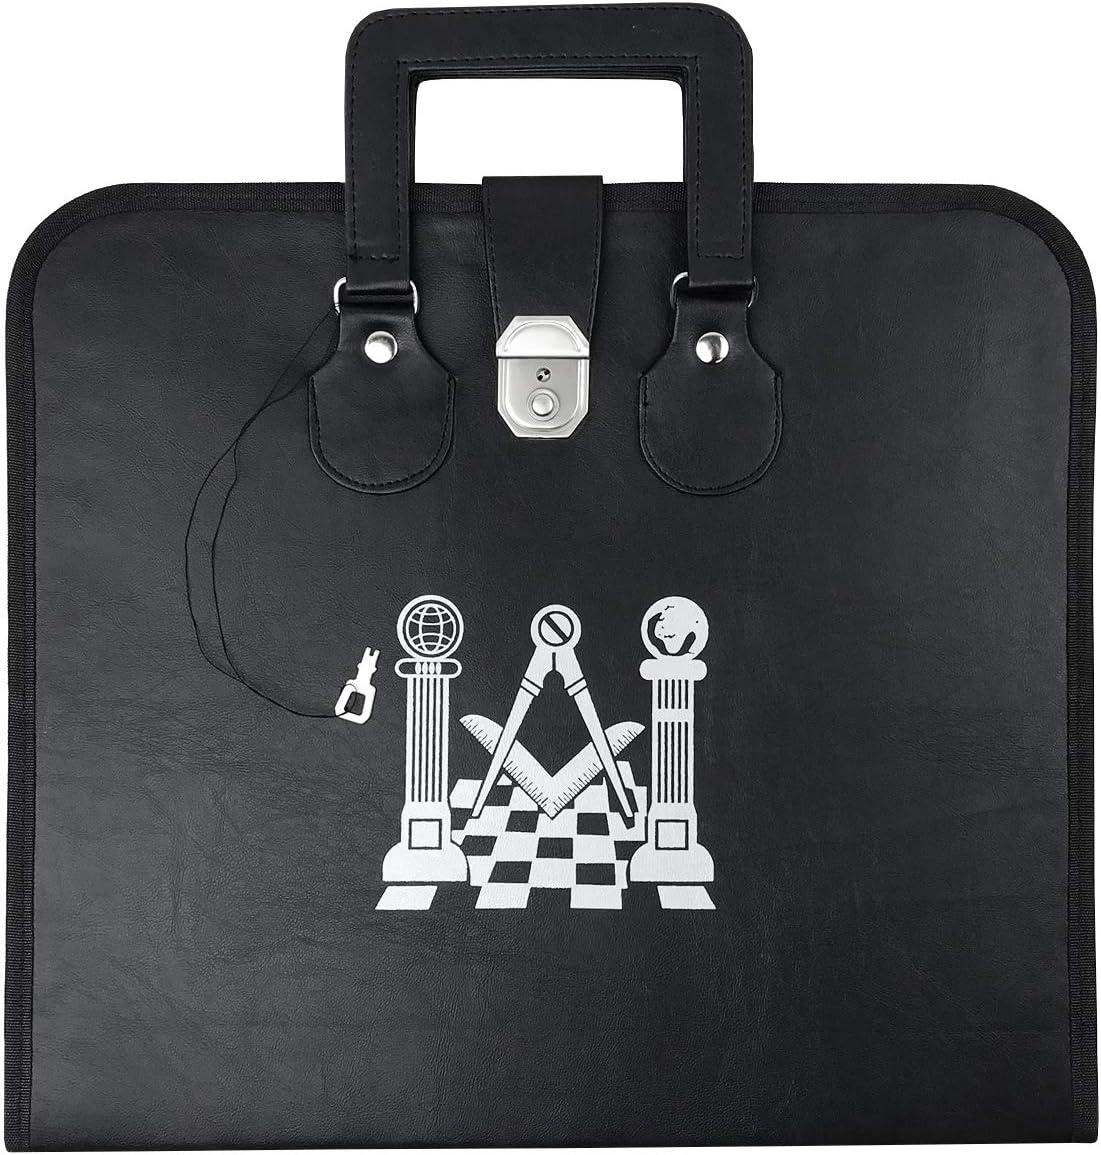 Masonic Apron Case with Overseas parallel import Max 86% OFF regular item Printed Pavement Pillars Logo MB034